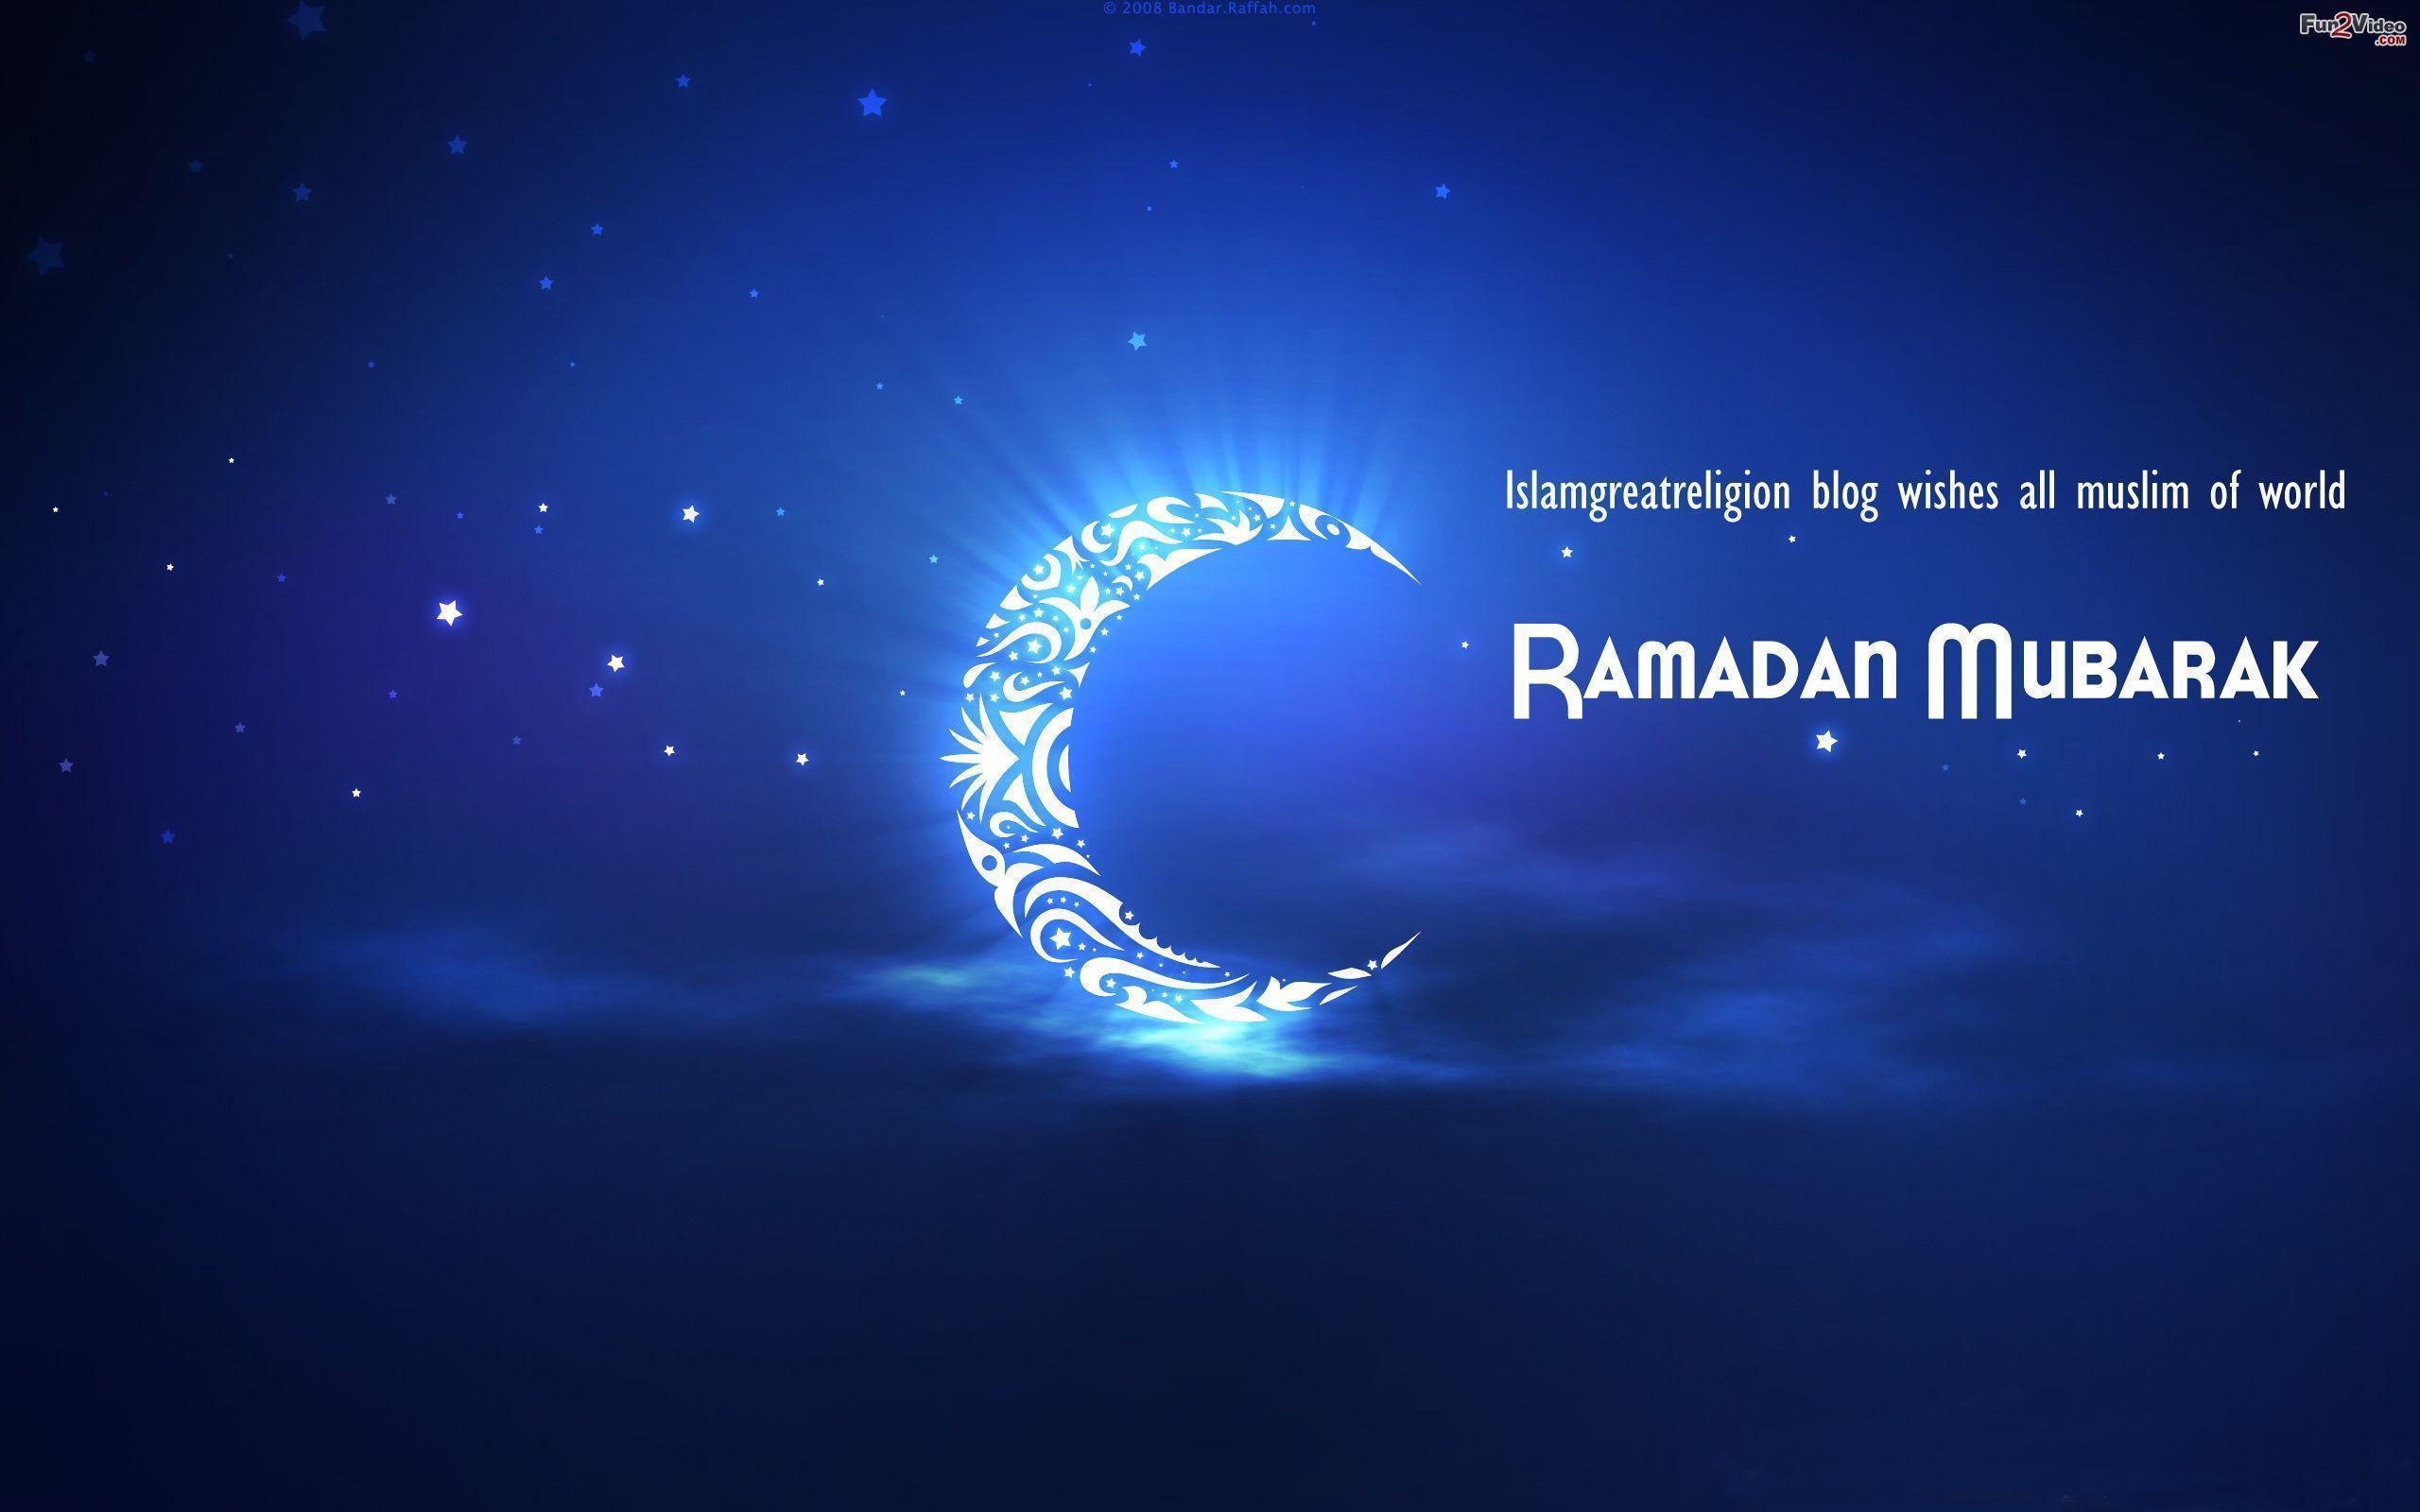 Ramadan Wallpapers For Computer For Ramadan Mubarak and Happy Ramadan